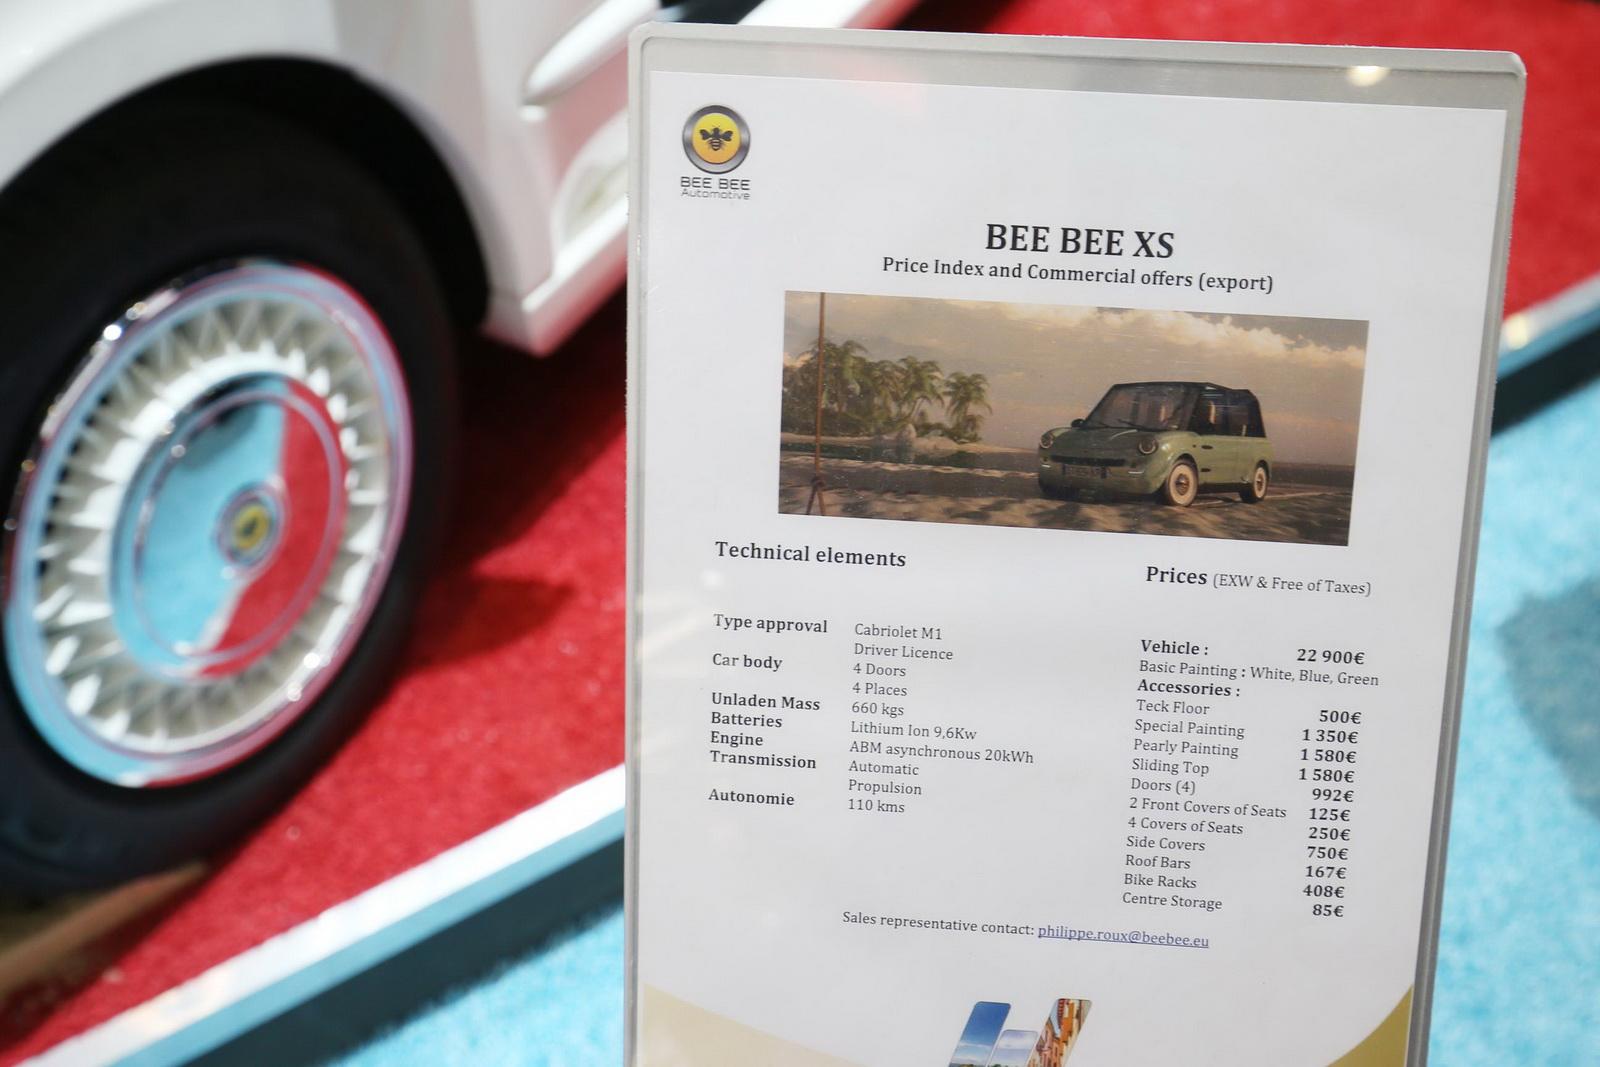 Bee-Bee XS 2016